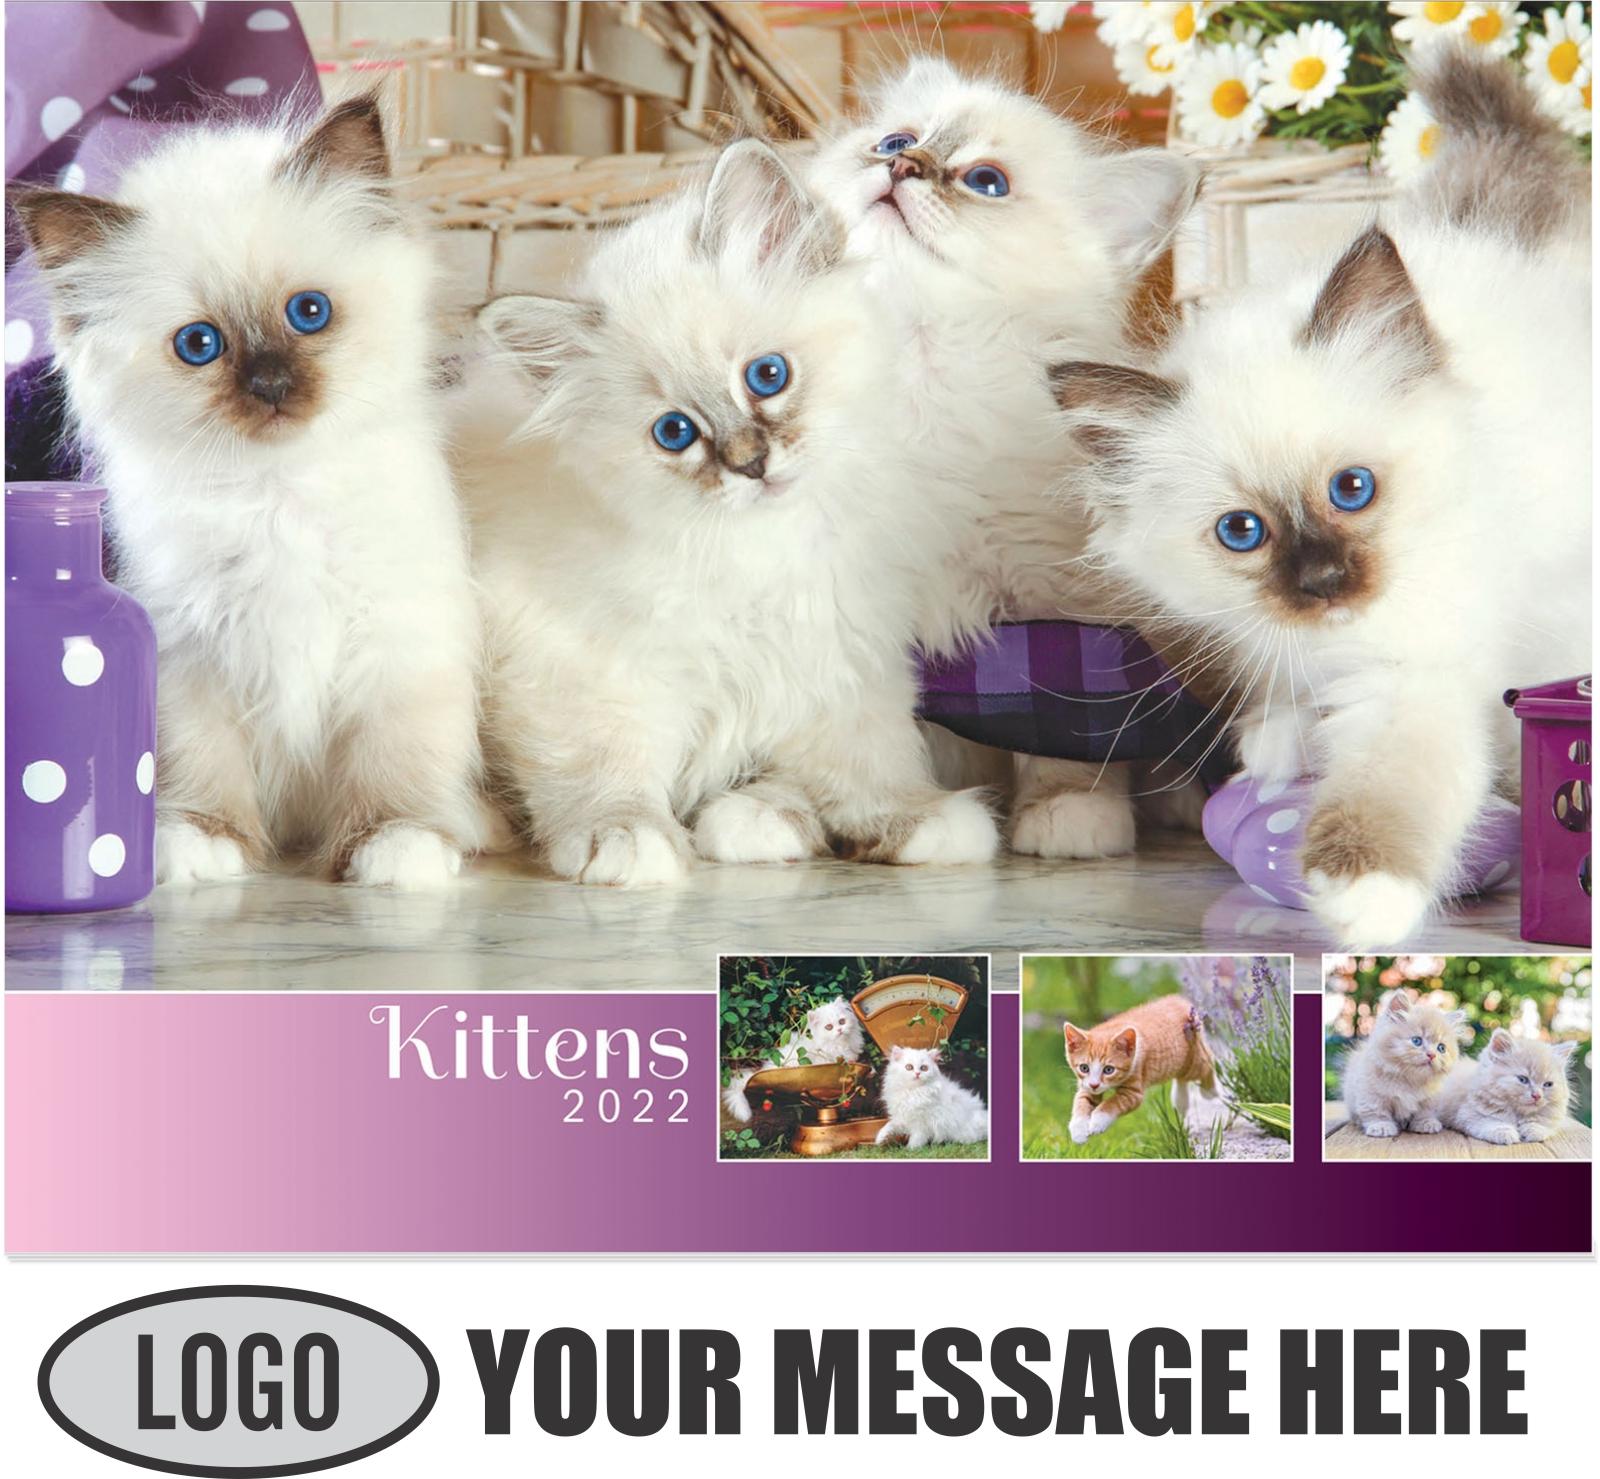 2022 Kittens Promotional Calendar